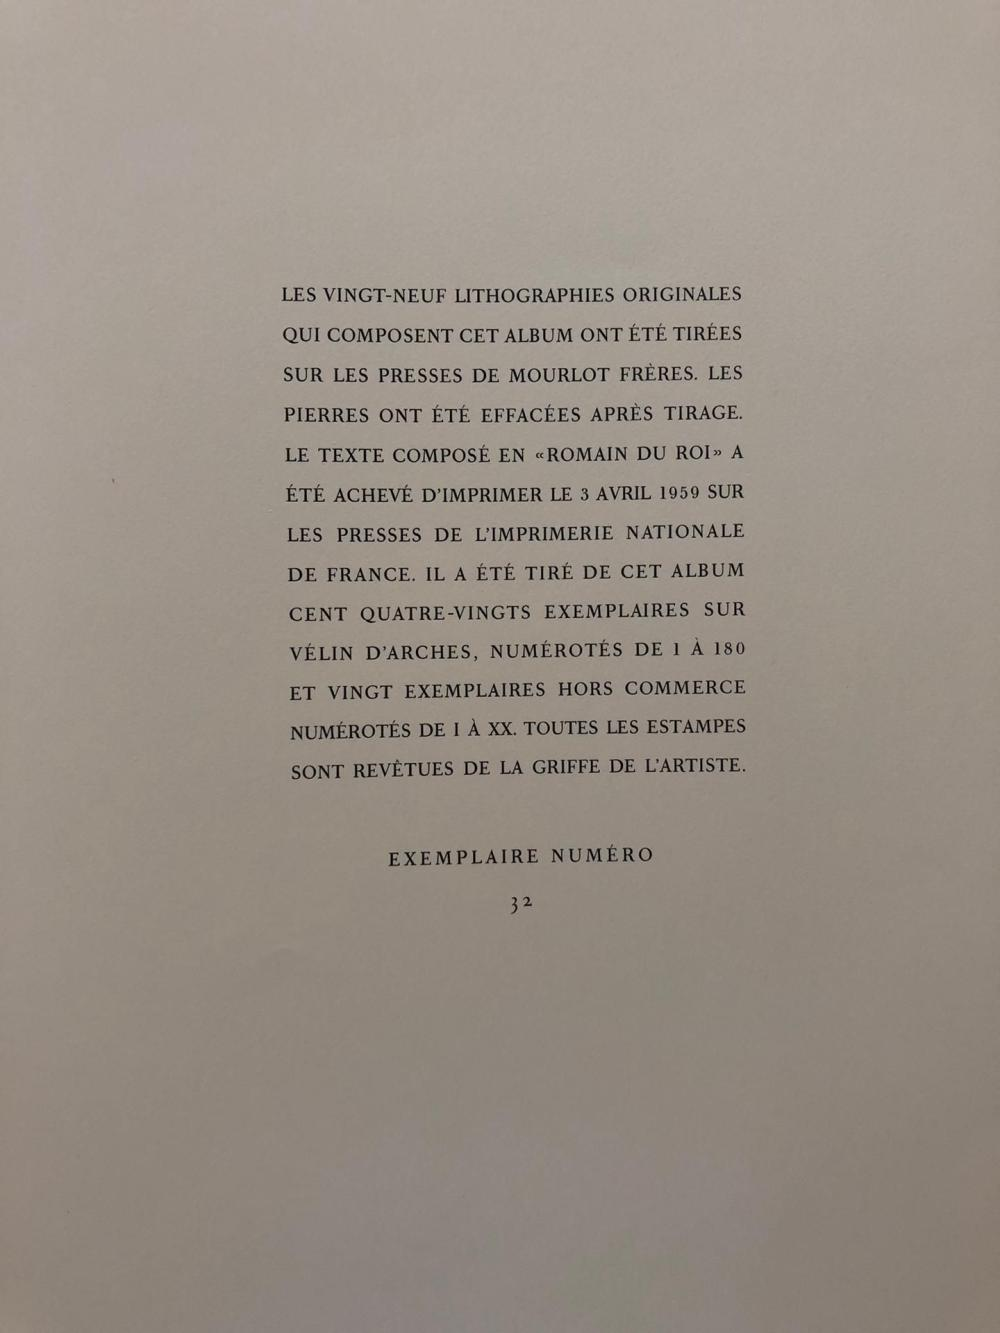 Fernand Léger - La rue de Dantzig ou les abattoirs de Vaugirard, 1959